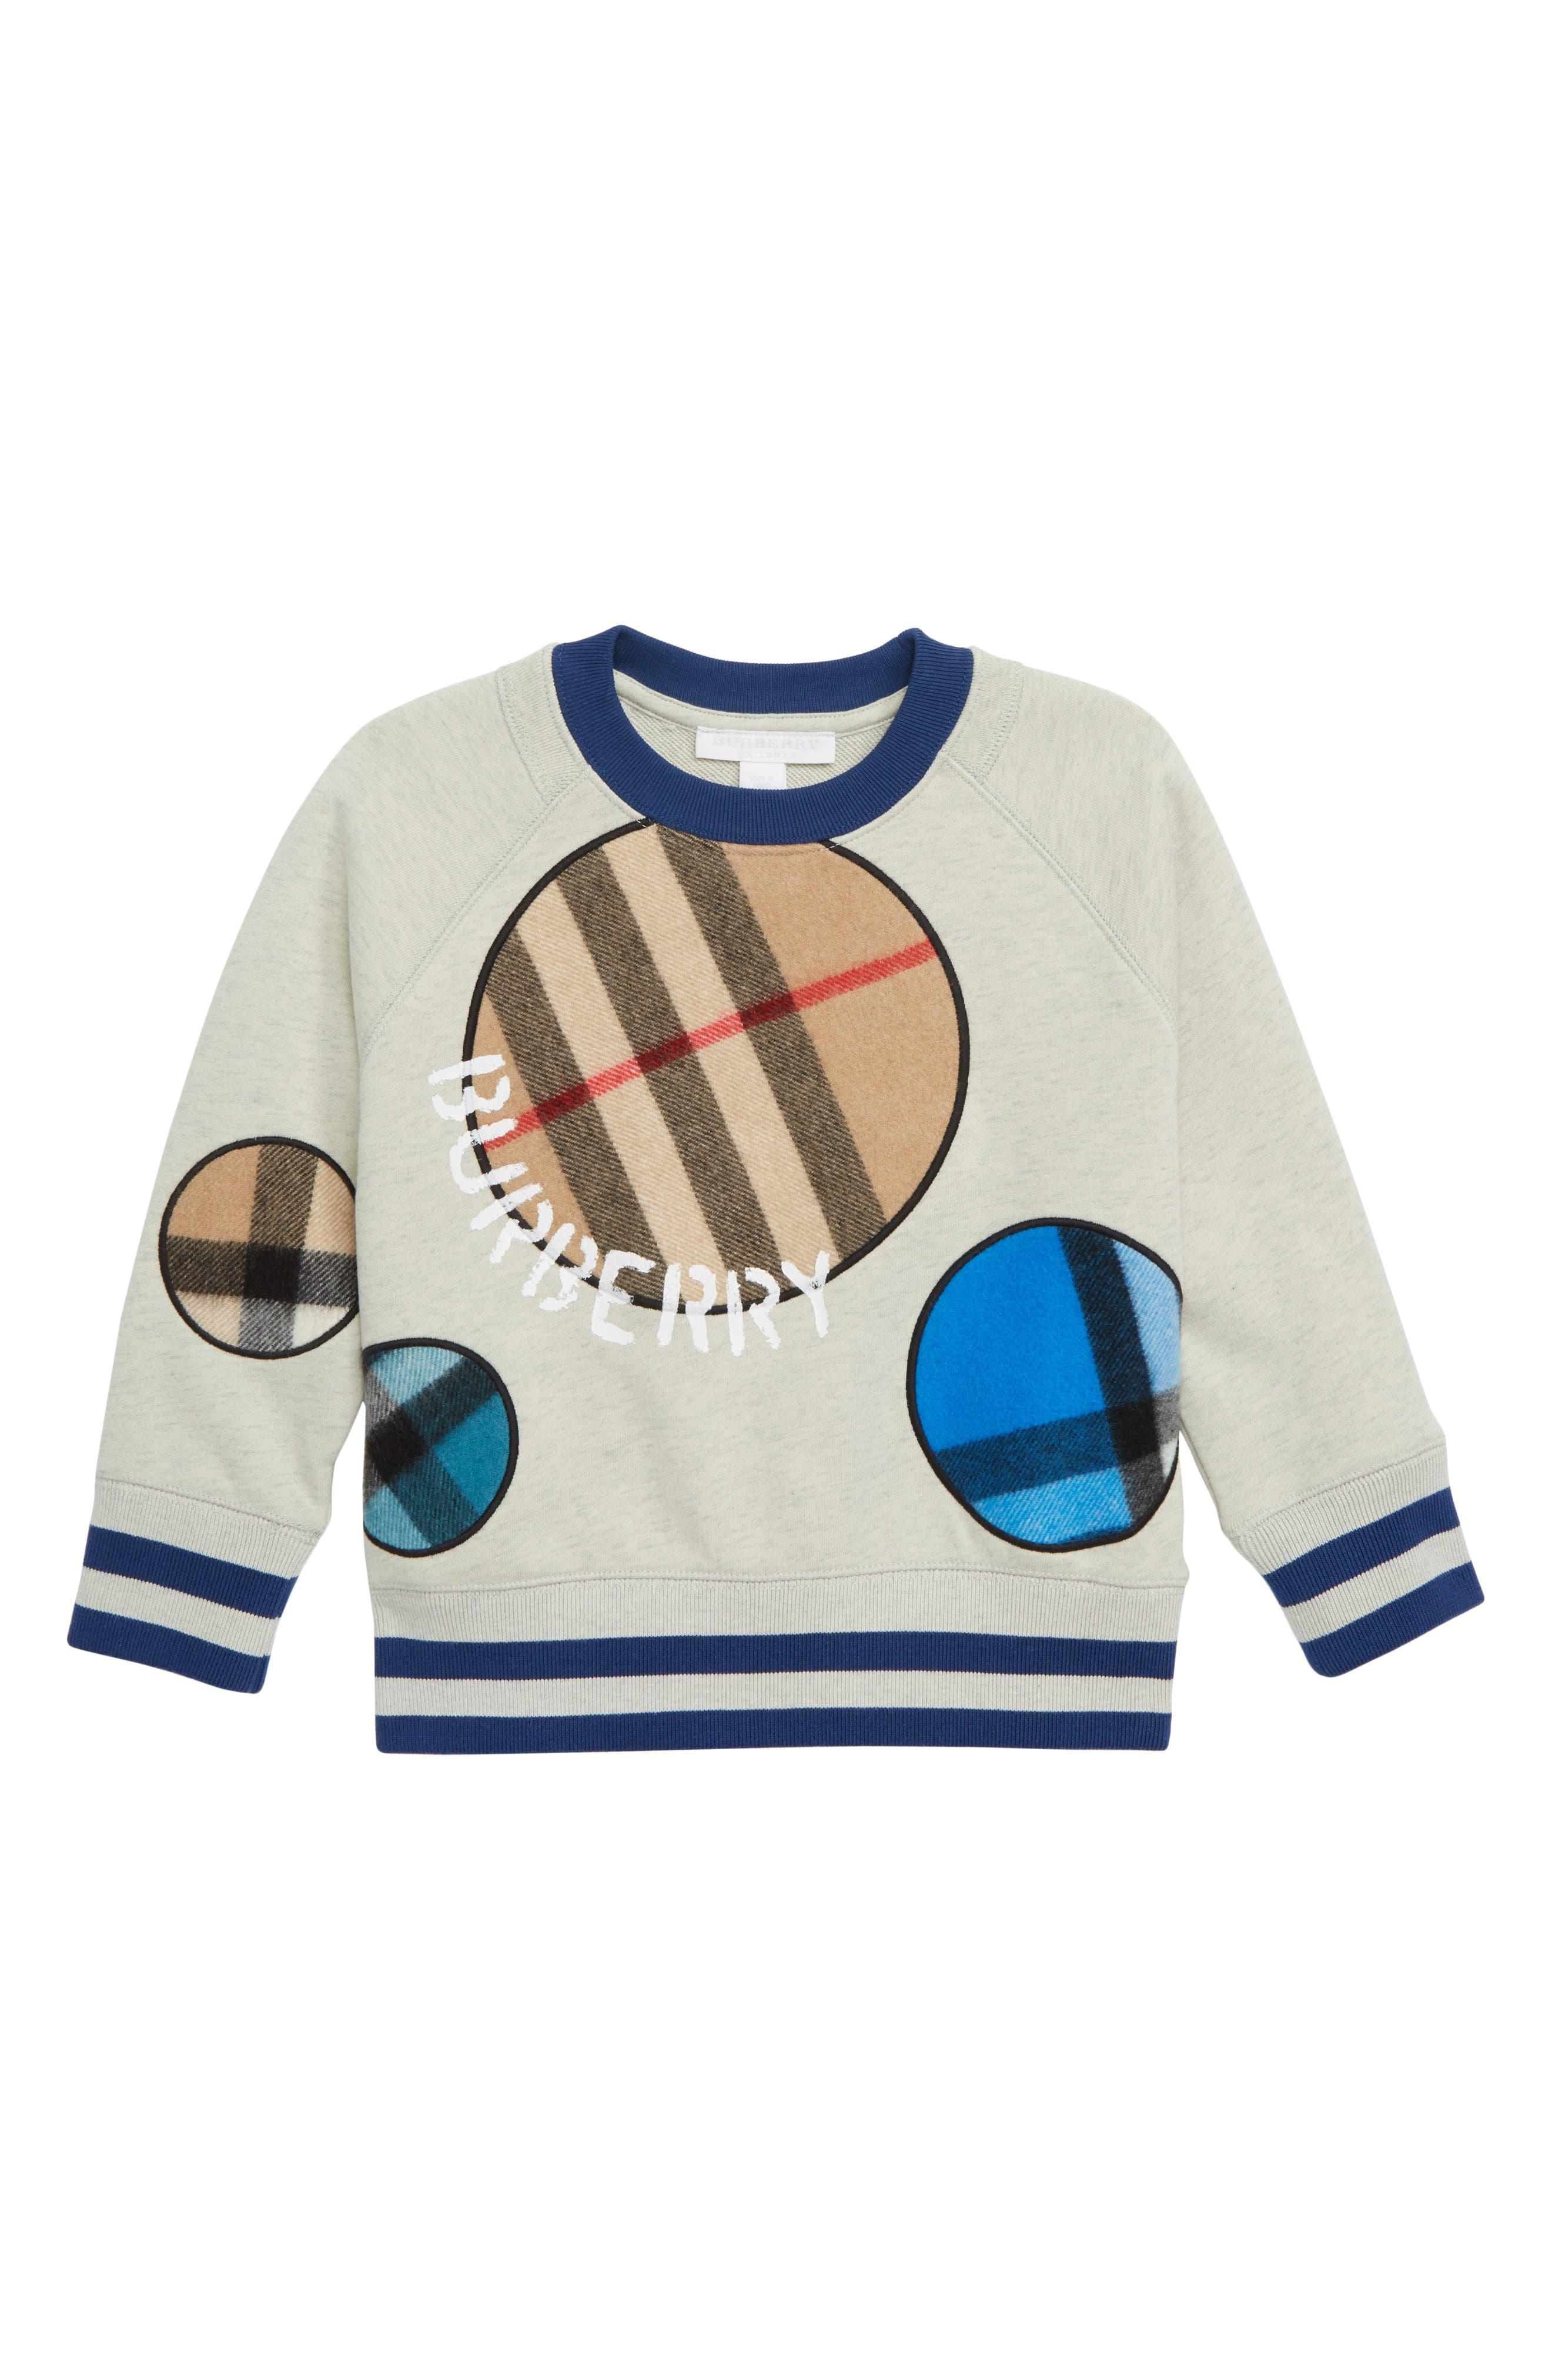 Check Dots Sweatshirt,                             Main thumbnail 1, color,                             MULTICOLOUR